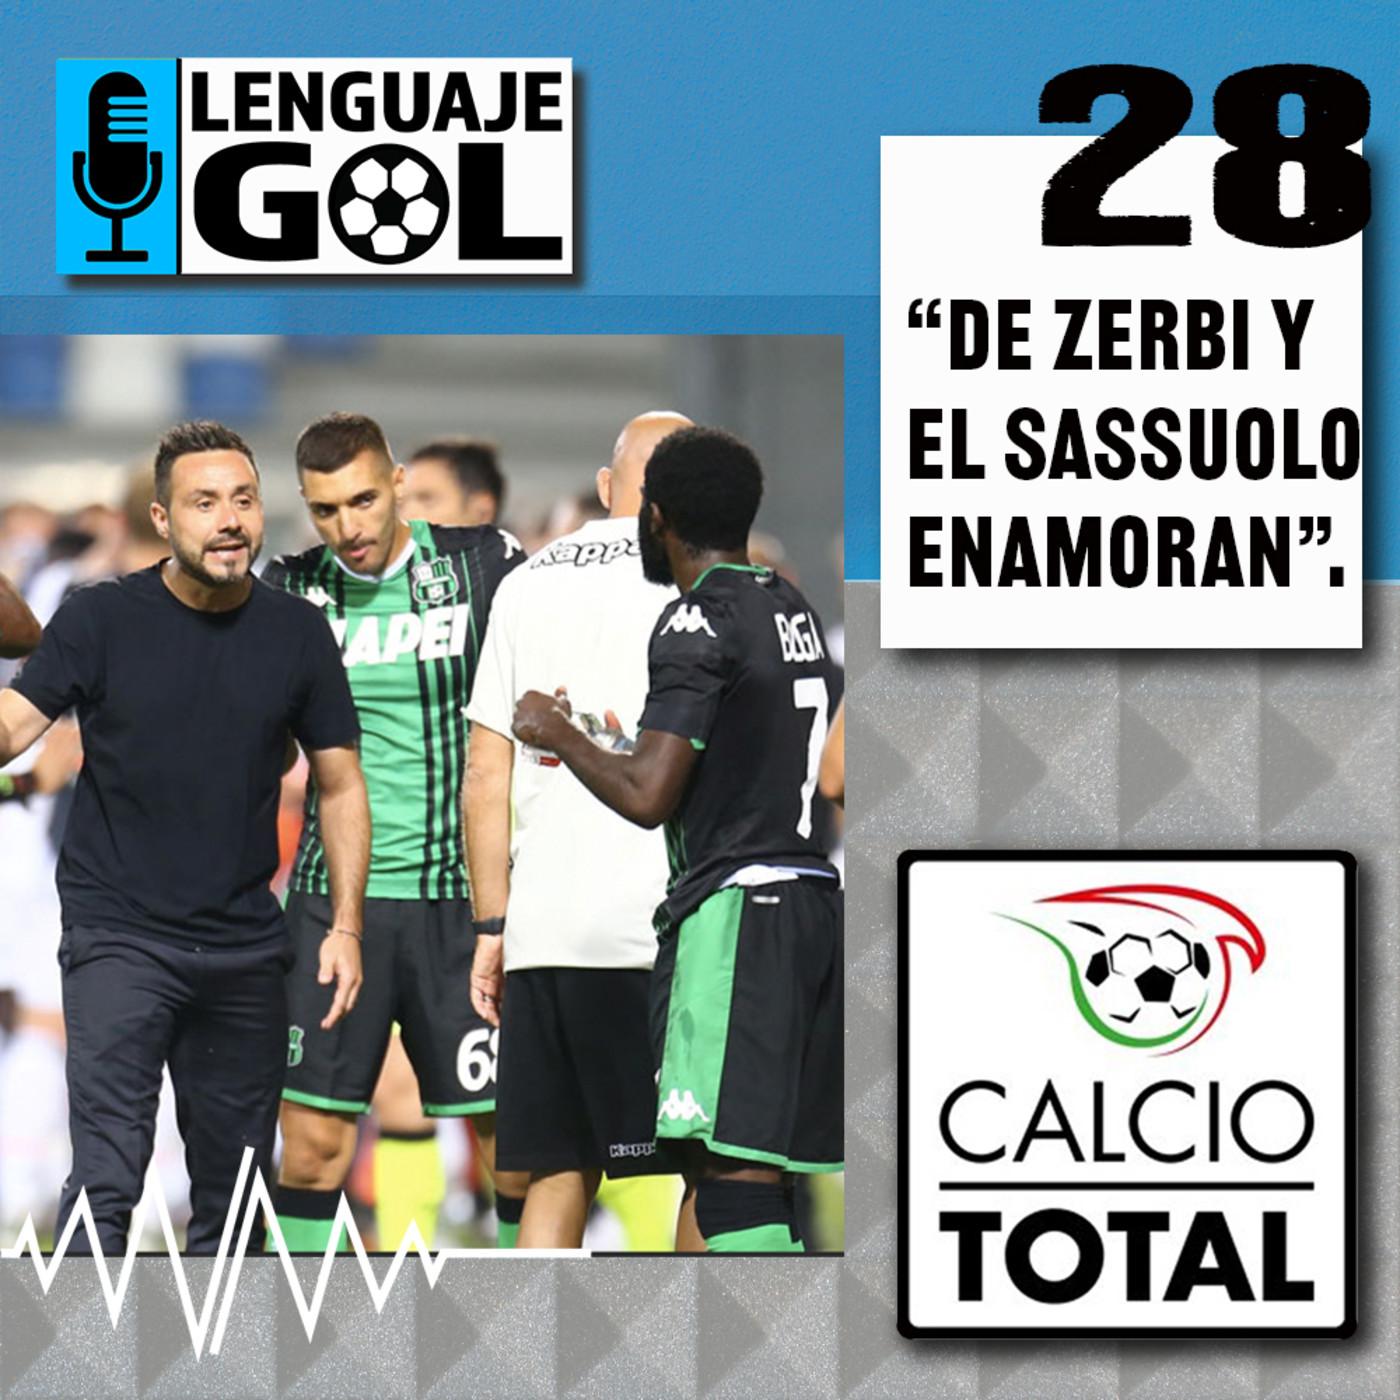 Ep. #28 CALCIO TOTAL: